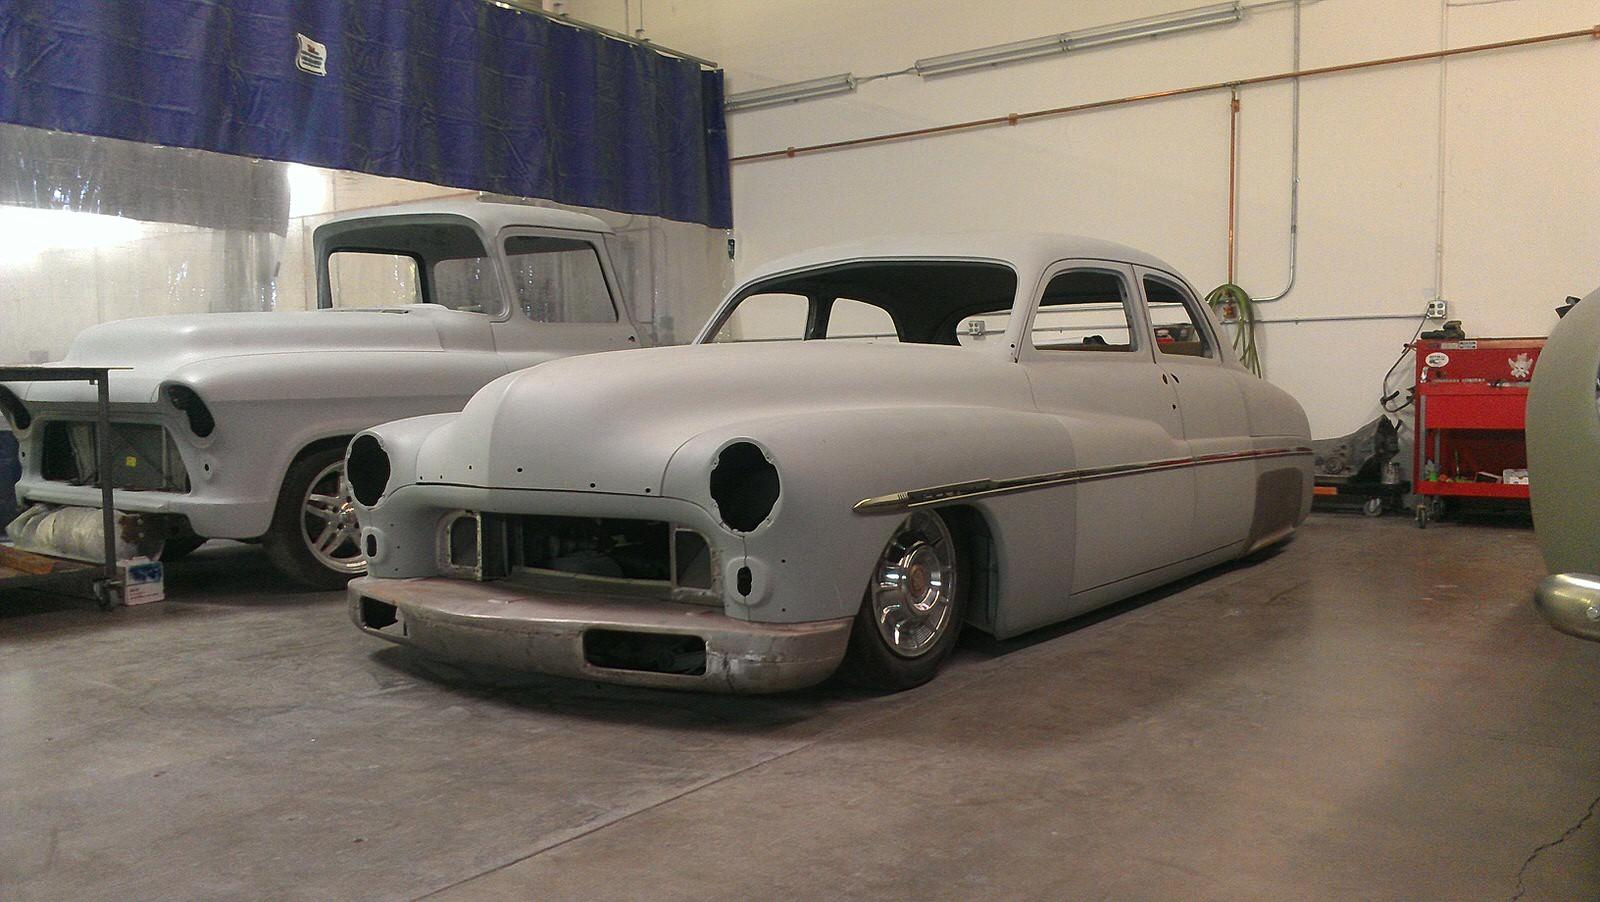 Ryan Finlayson 1950 Mercury - South City Rod & Custom